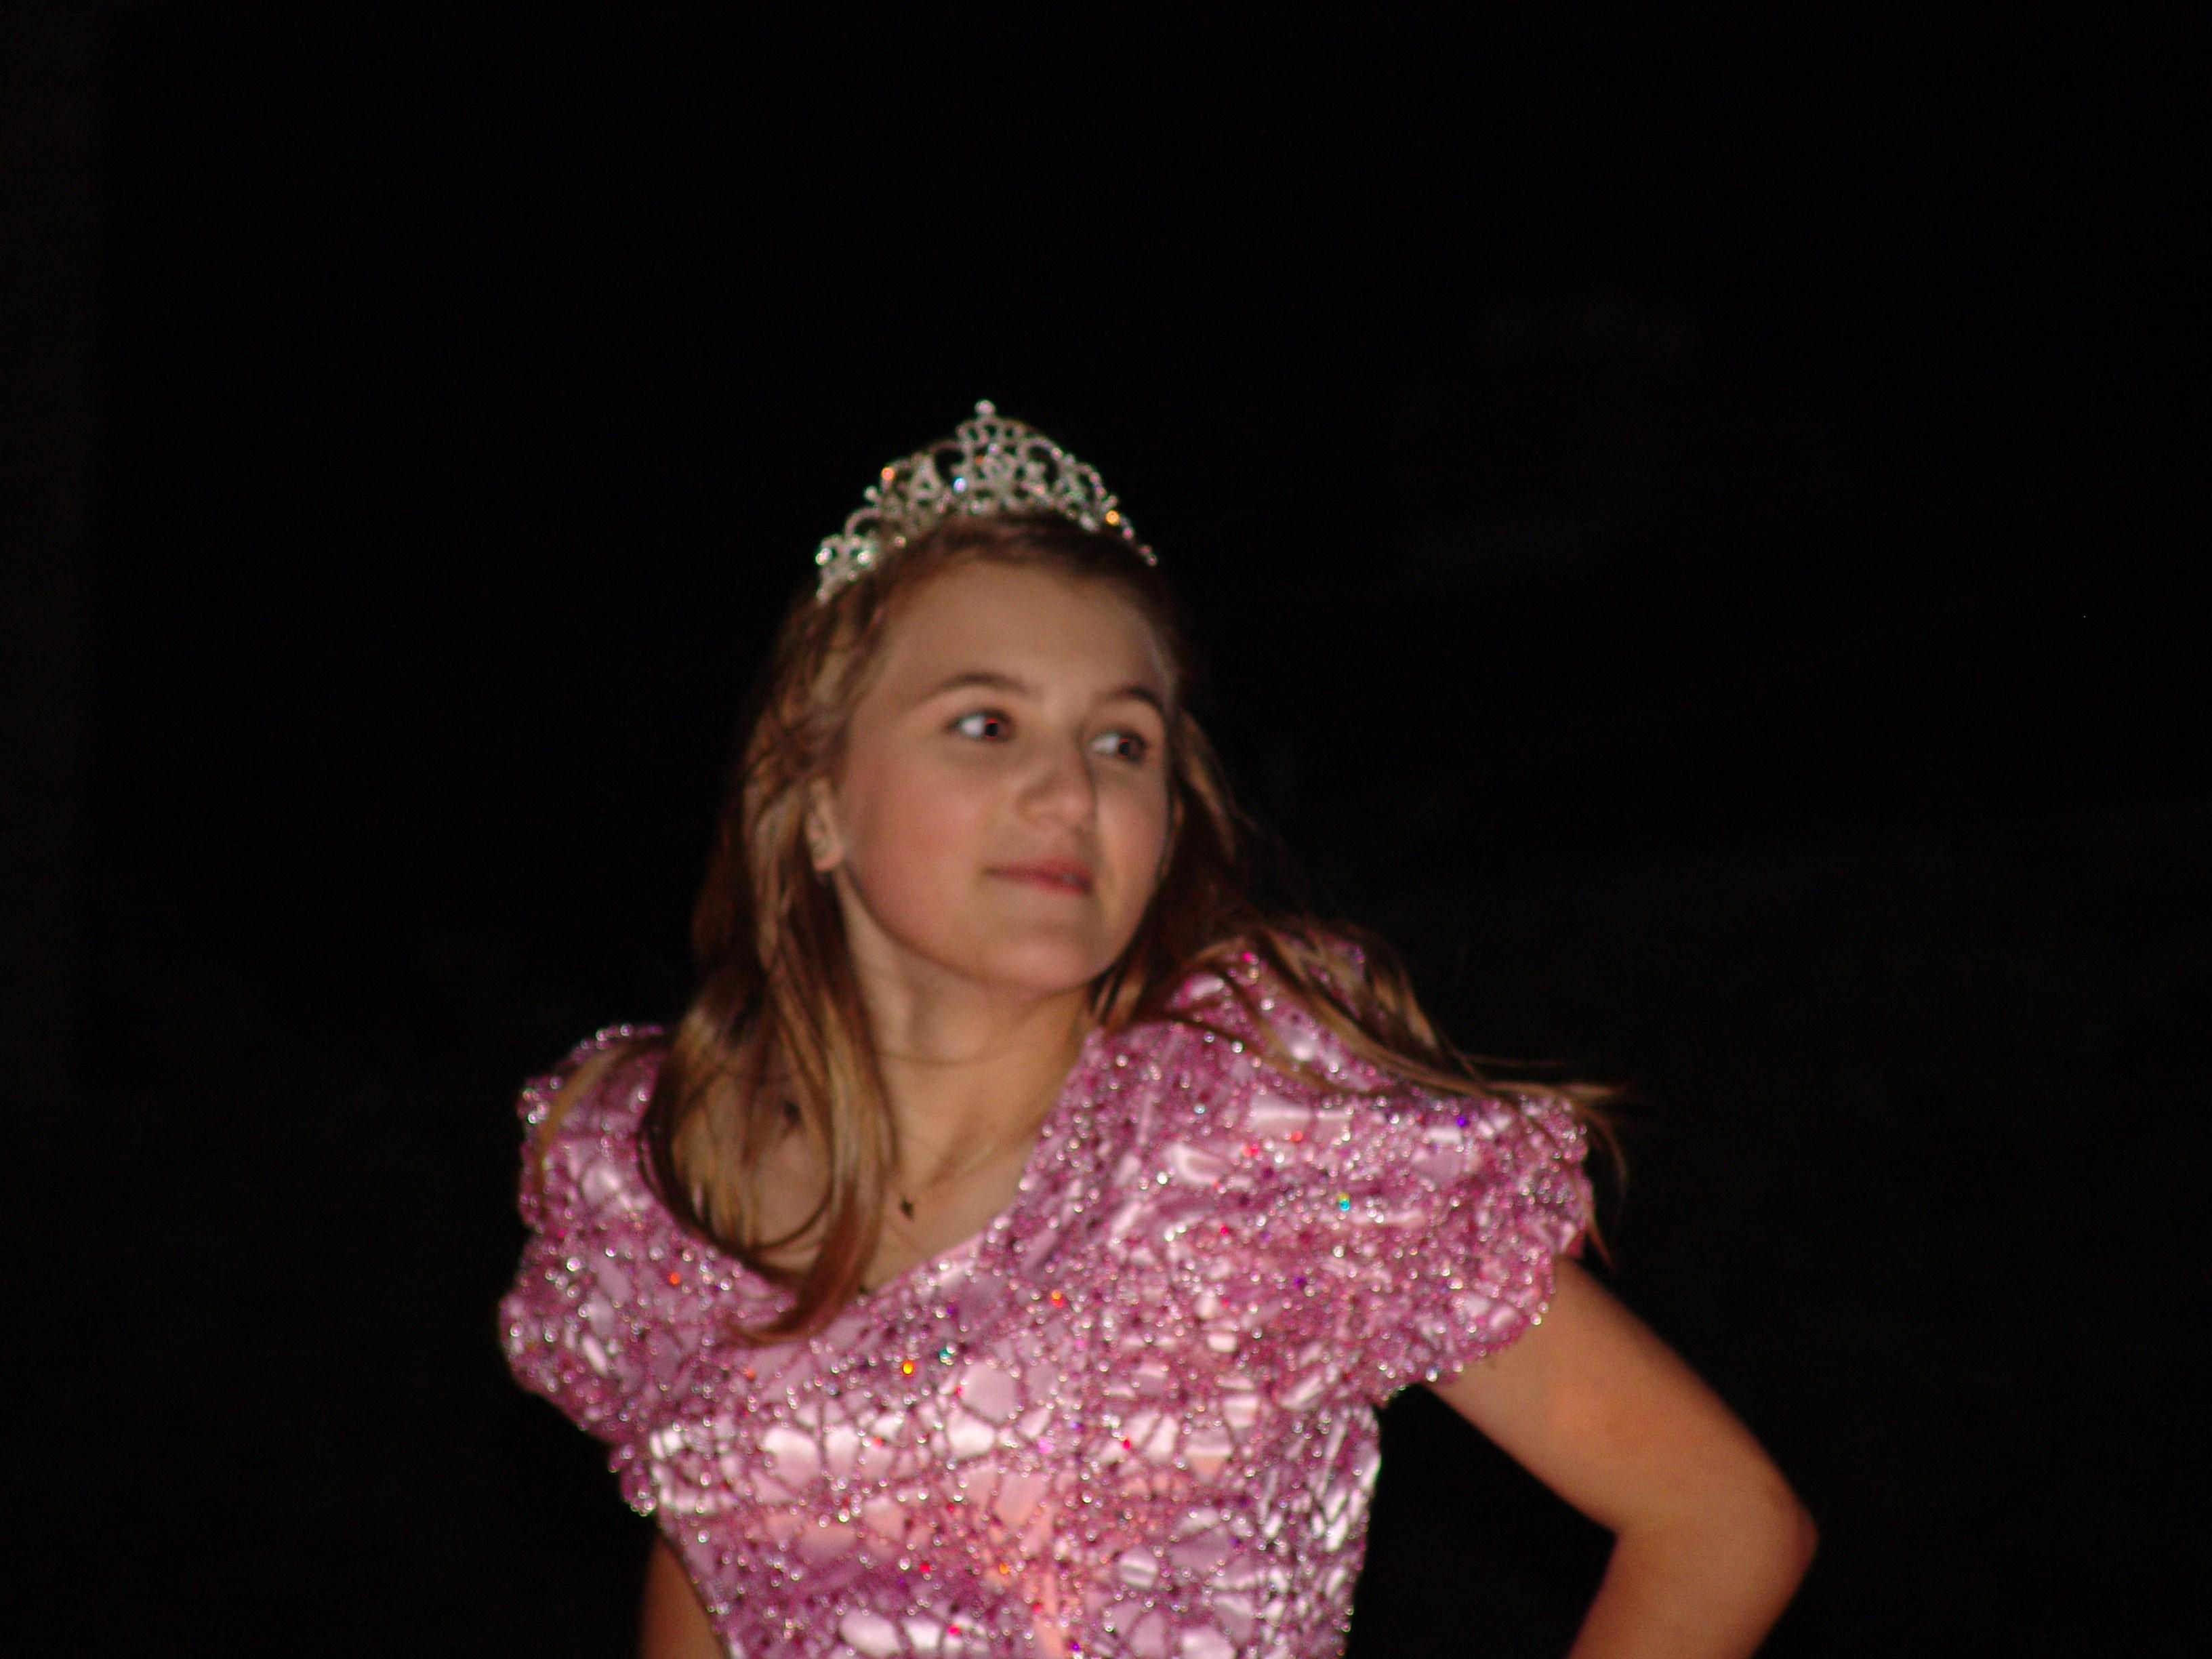 Cowes Princess